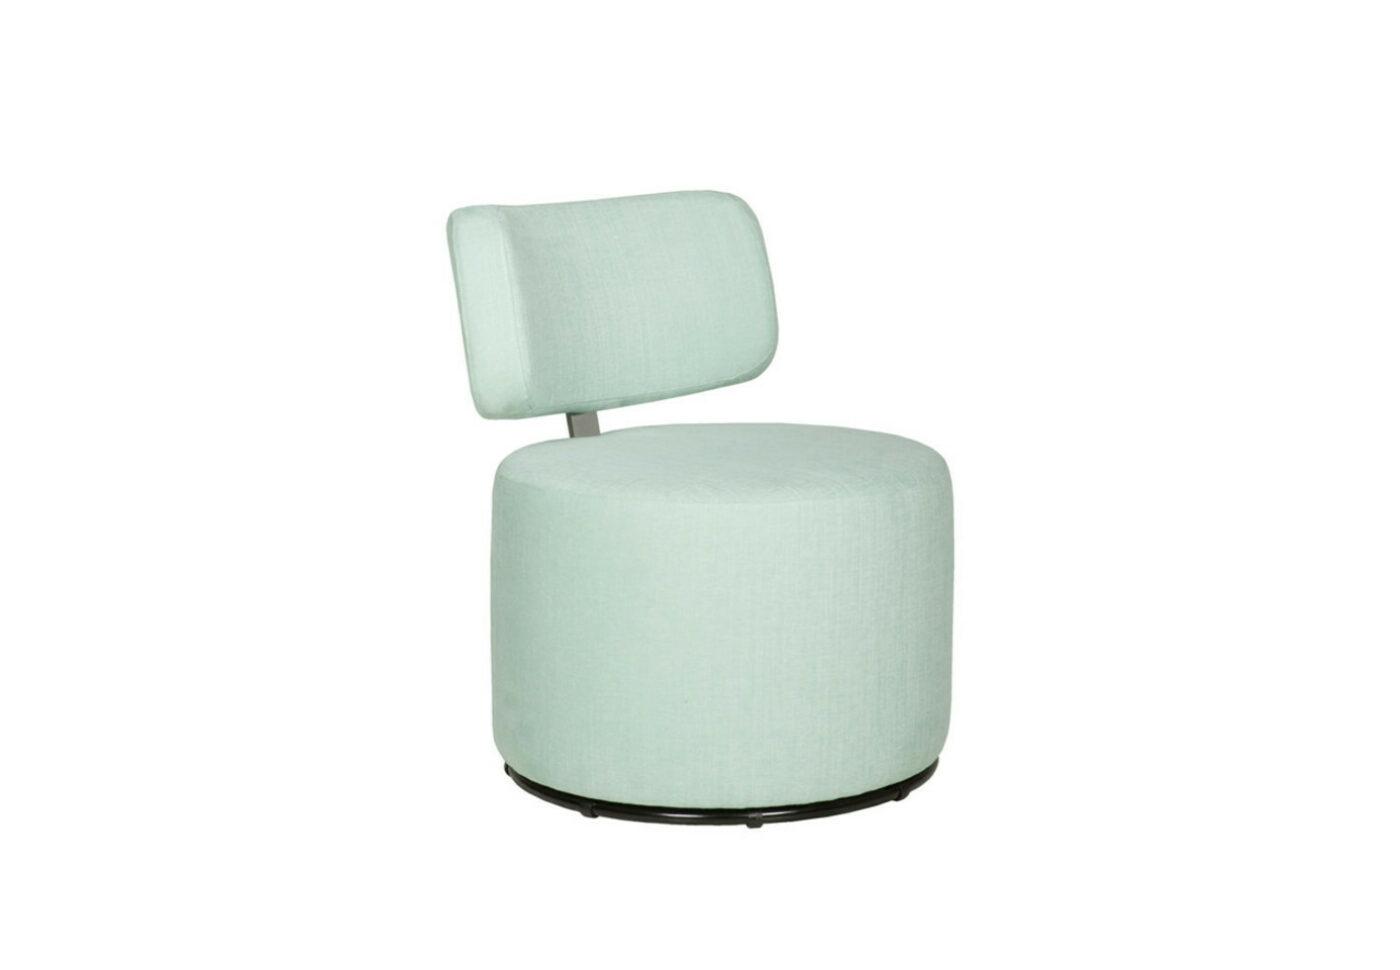 Mokka 3 fauteuil